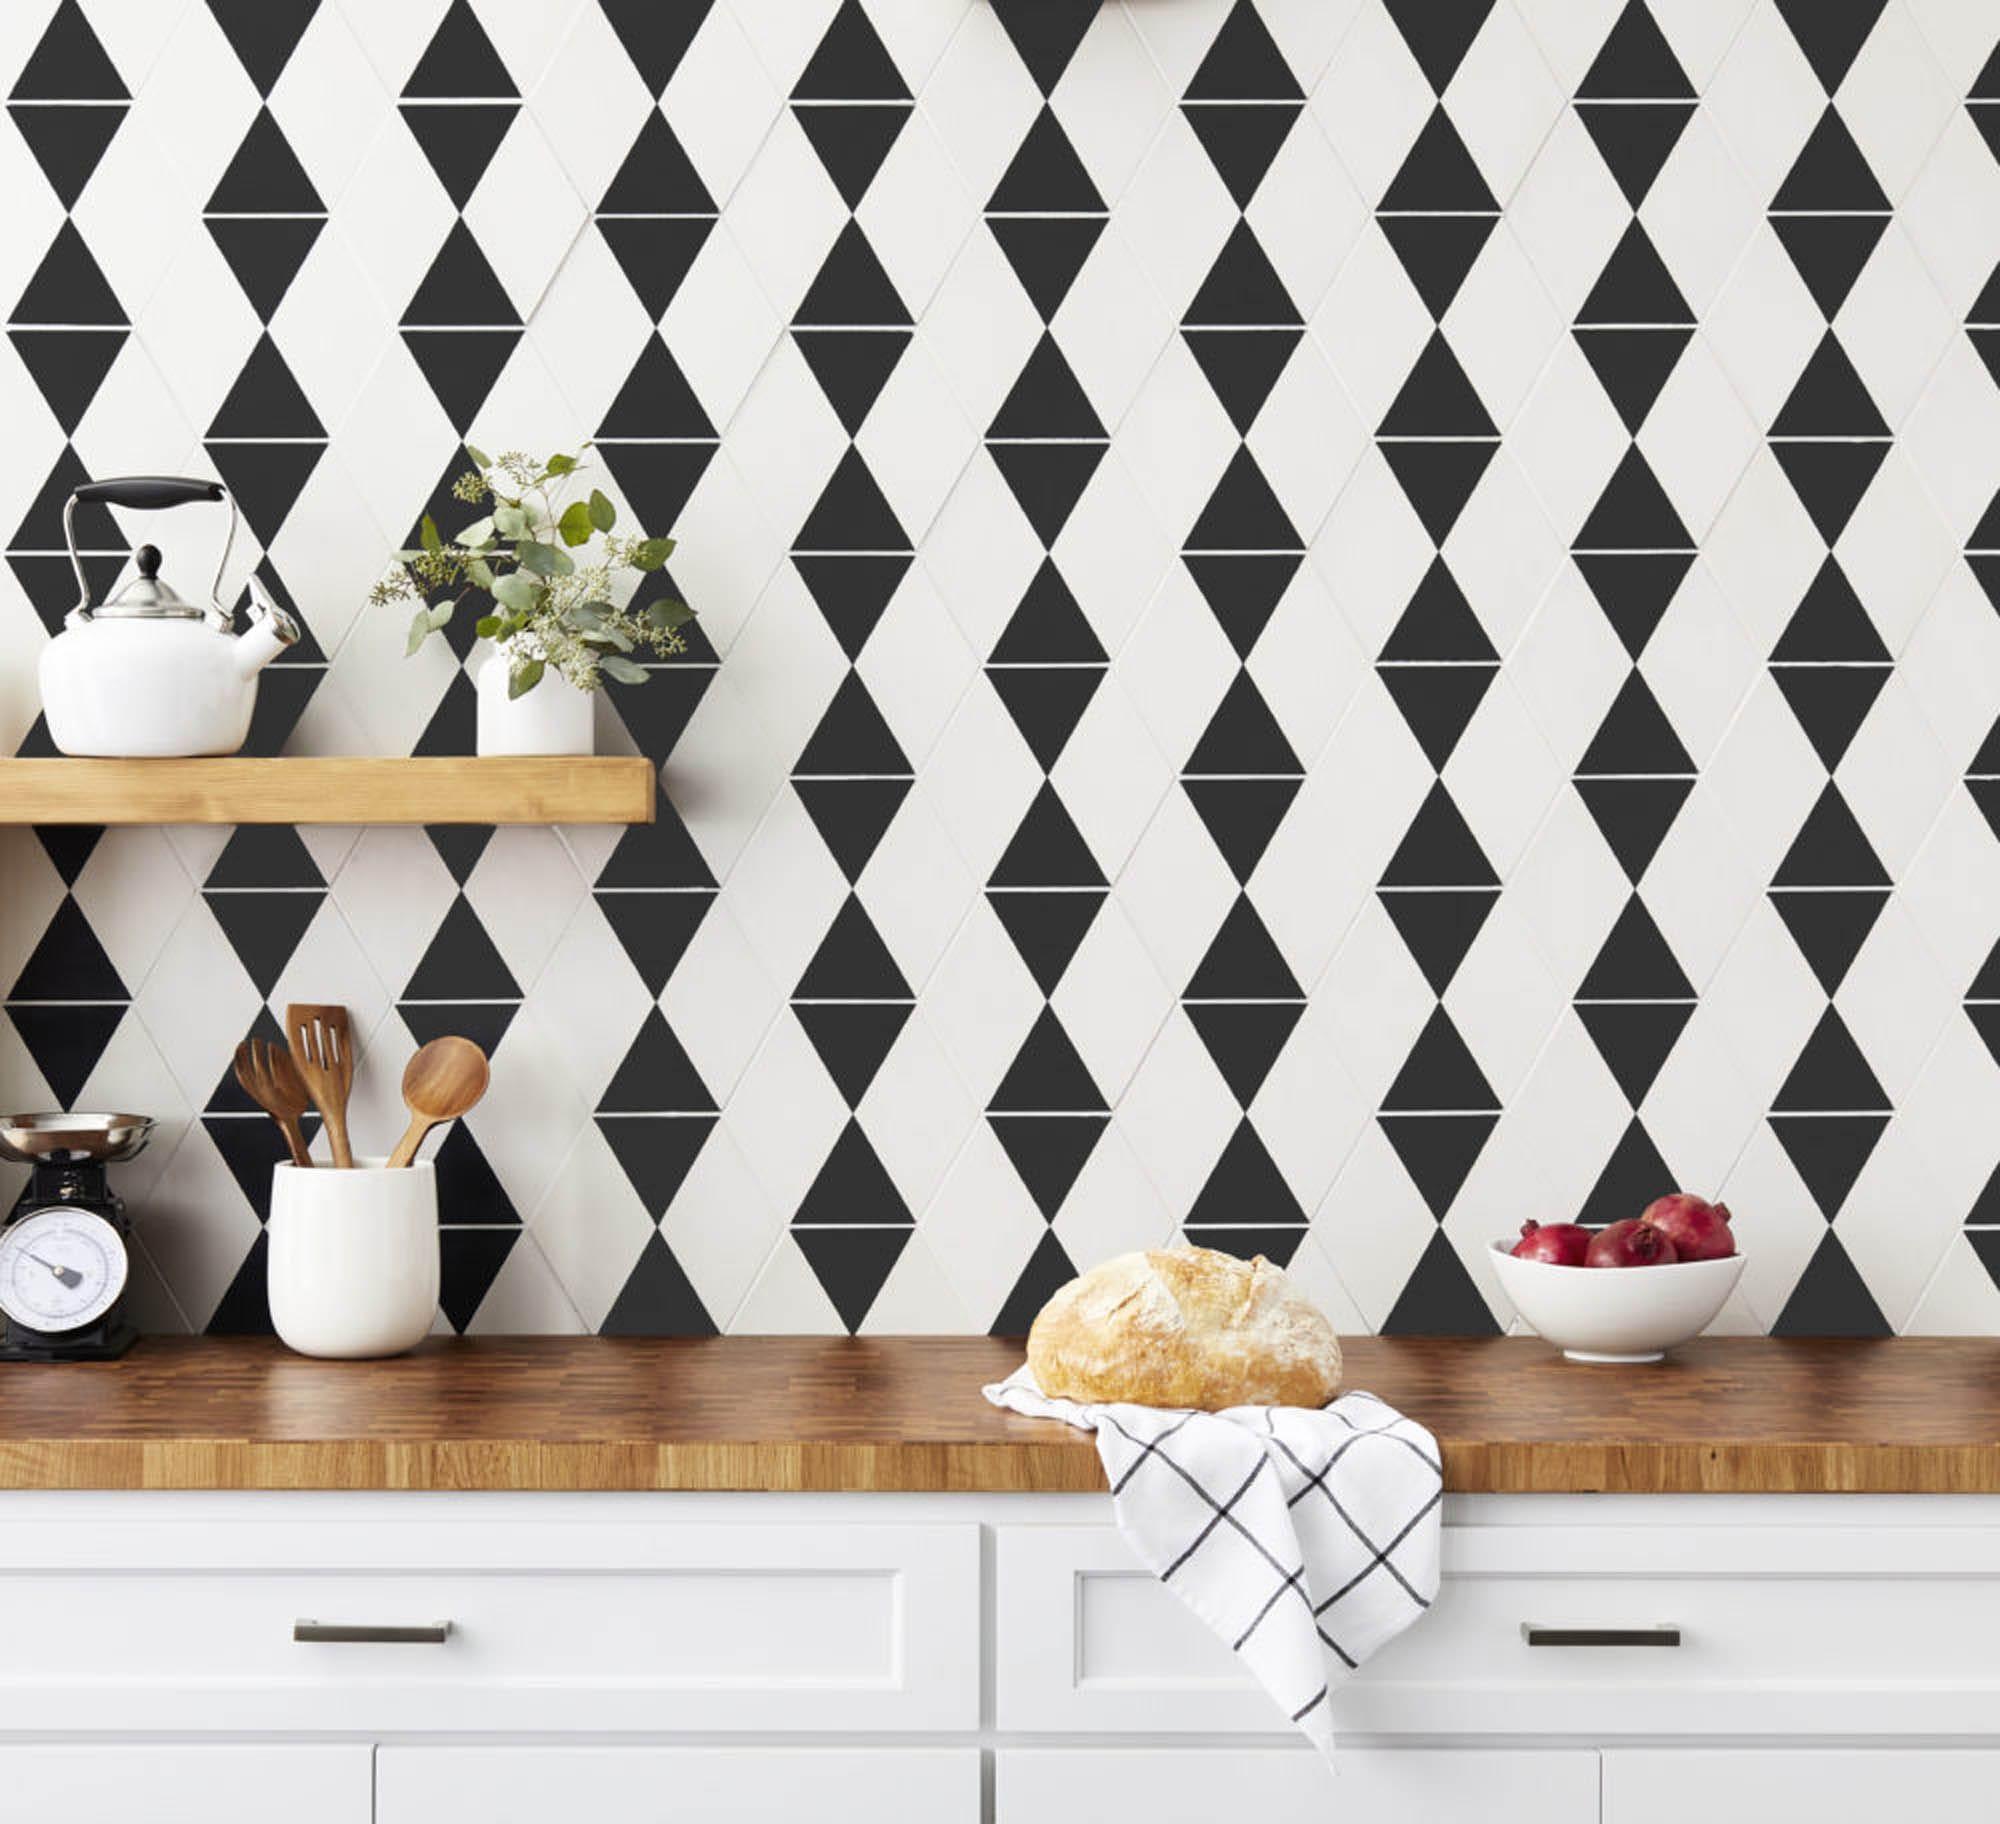 Black and white hexagonal wall tile